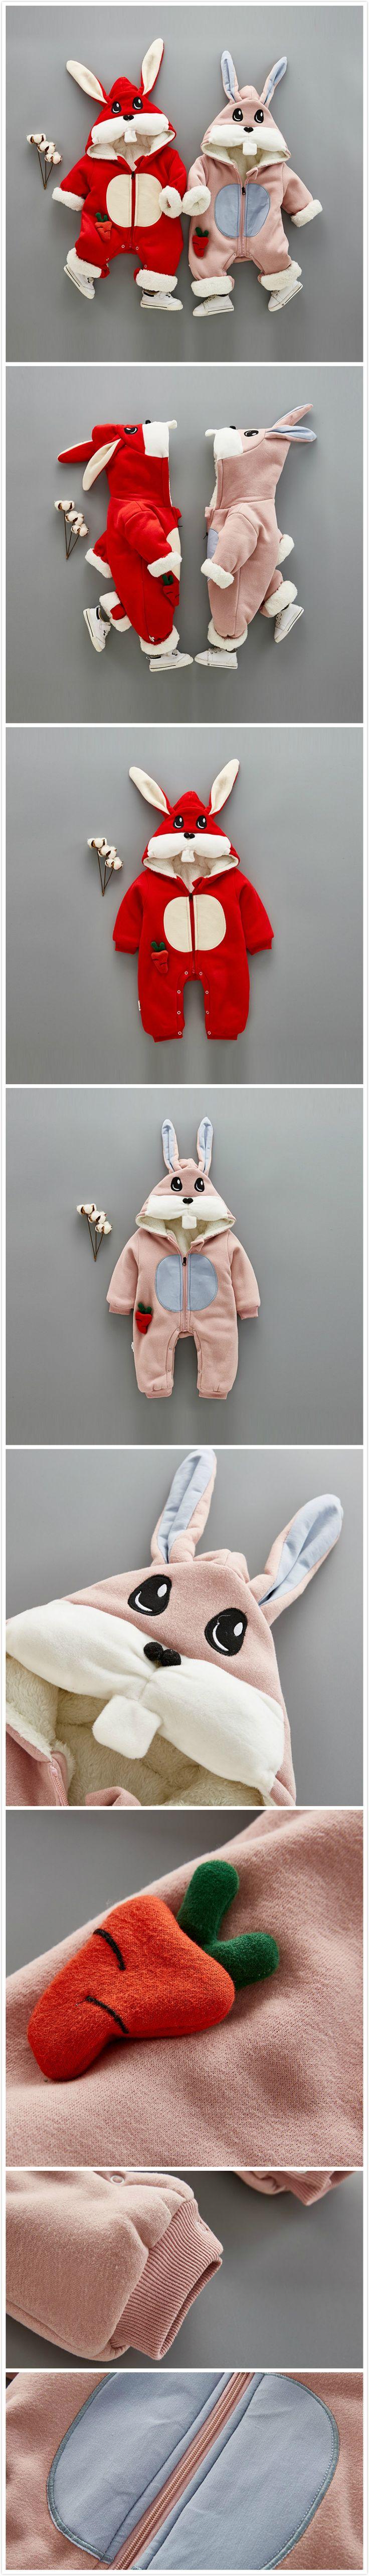 2-Color Thicker Velvet Cute Rabbit Baby Winter Warm Jumpsuit